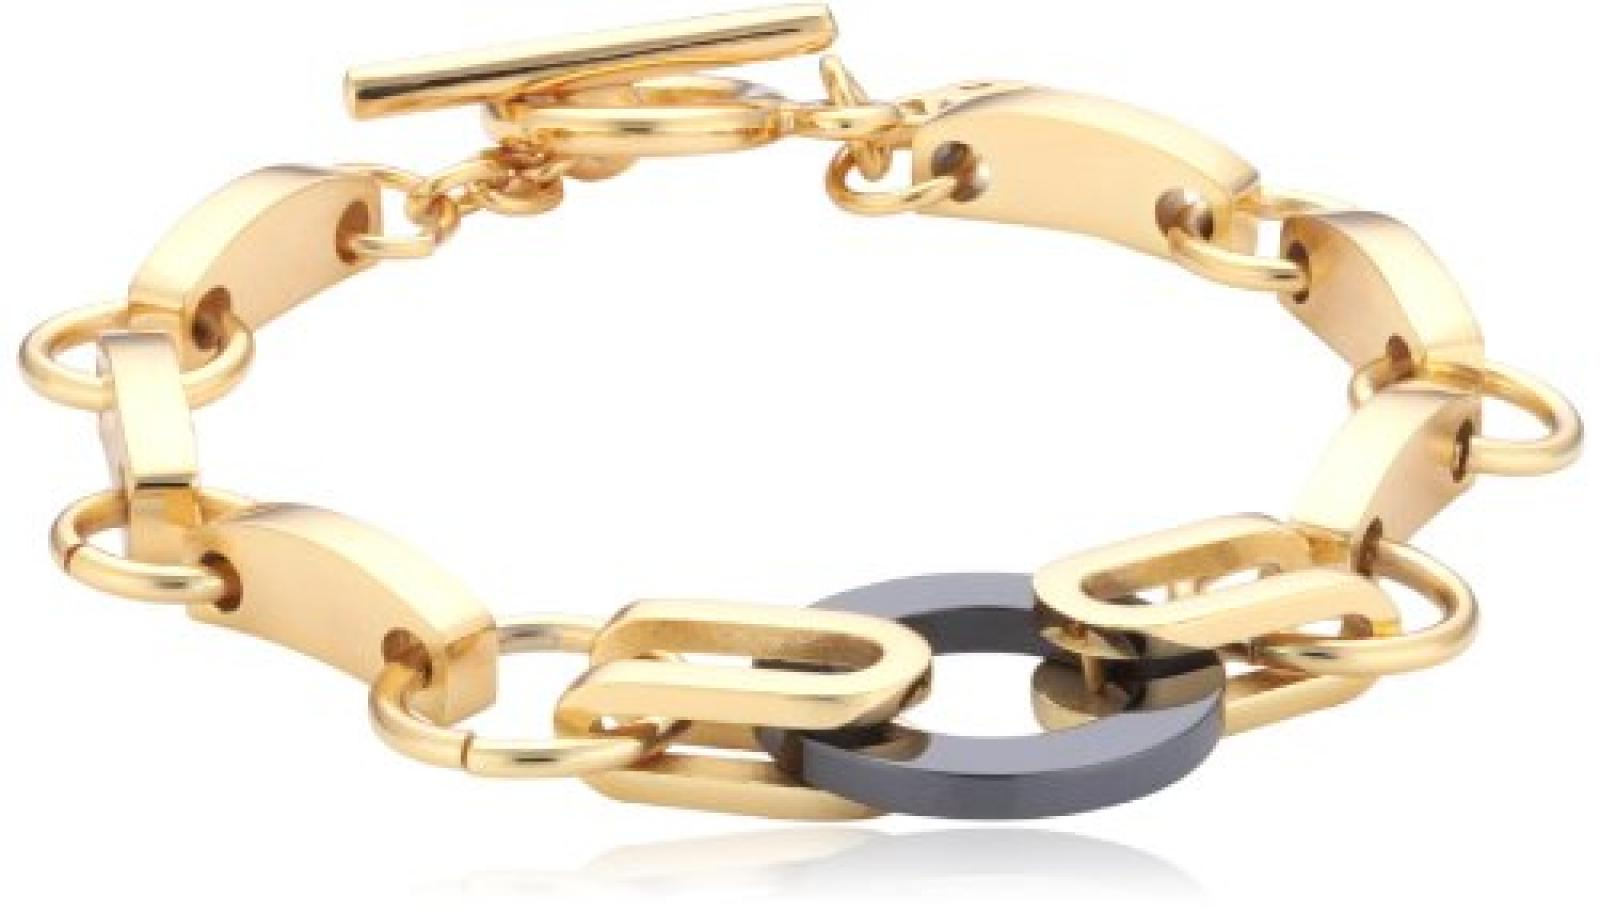 Mike Ellis New York Damen Armband Edelstahl Acryl 19.0 cm S173 IPG